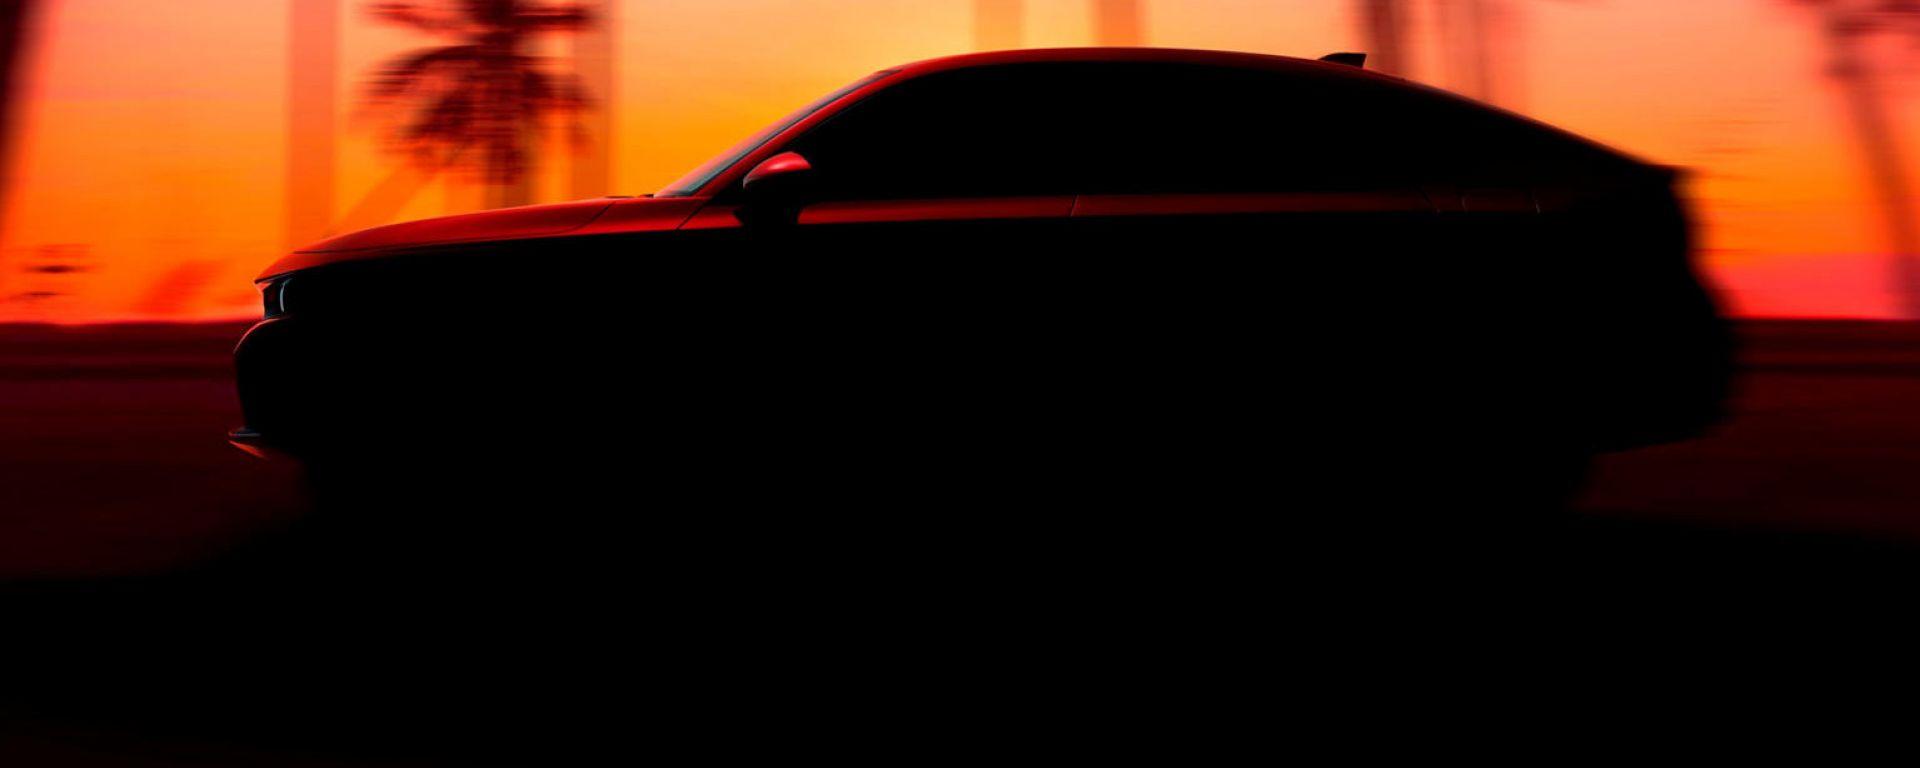 Nuova Honda Civic Hachback 5 porte